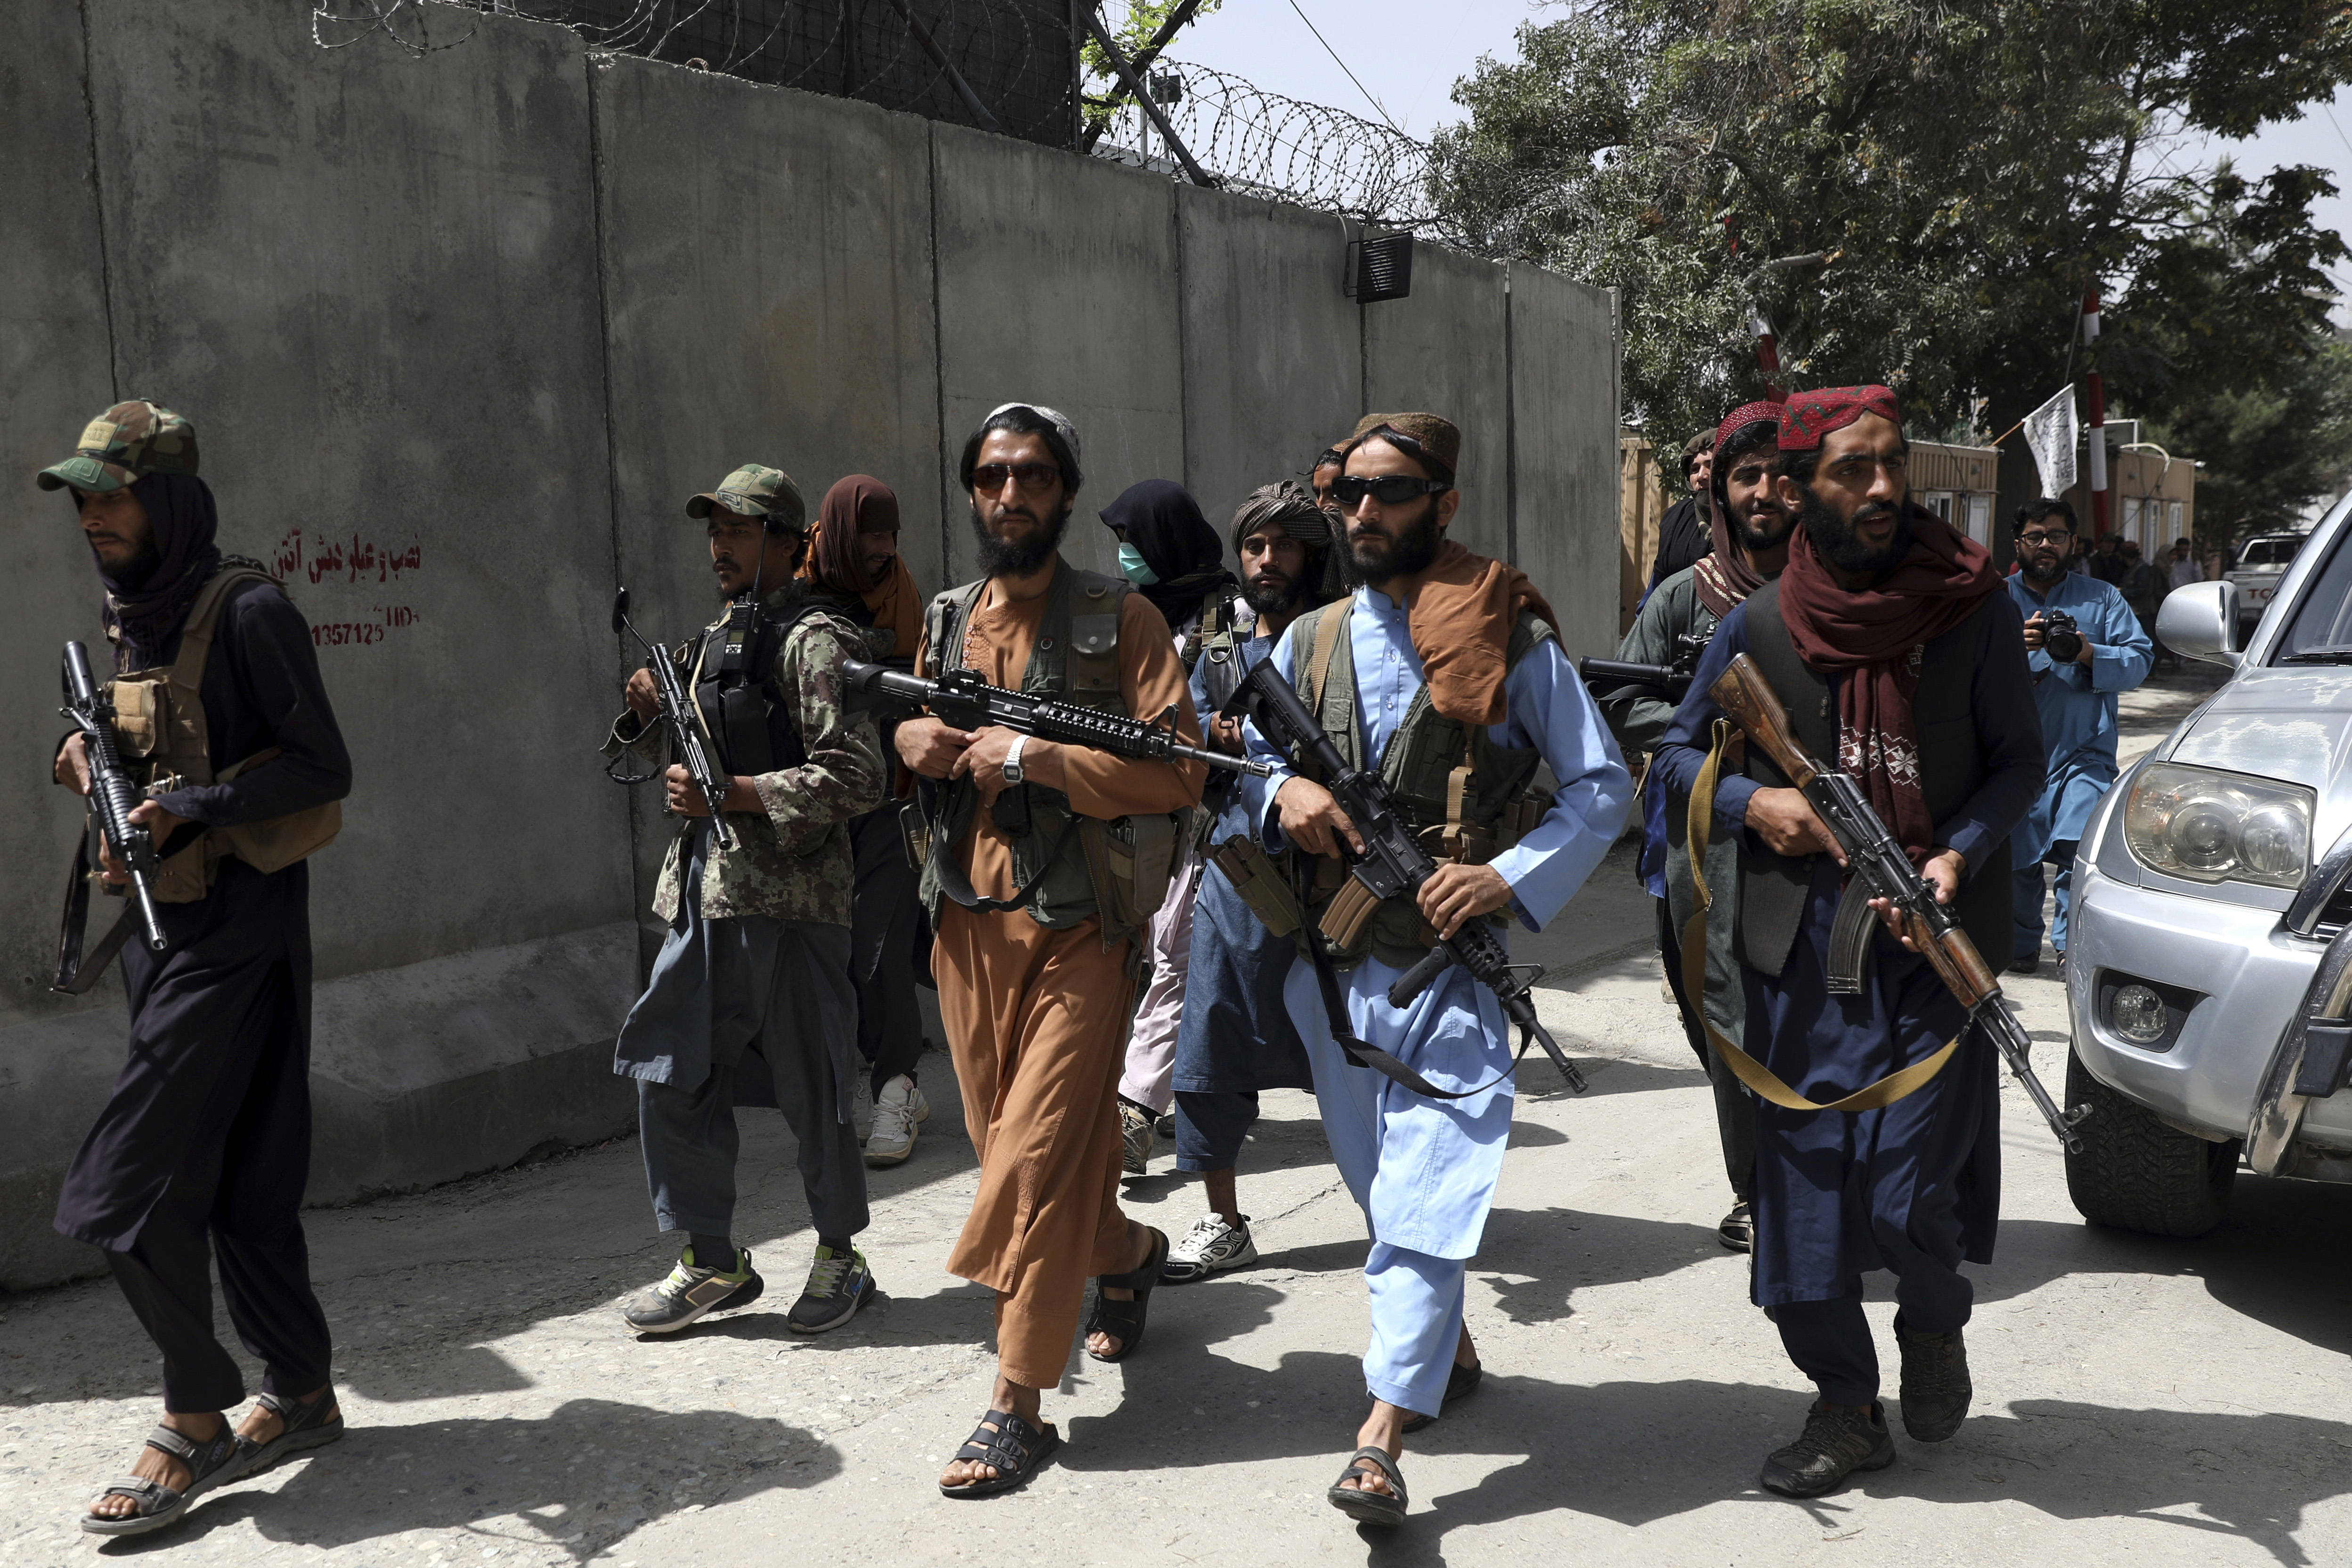 Taliban fighters patrol in Wazir Akbar Khan neighbourhood in the city of Kabul, Afghanistan.